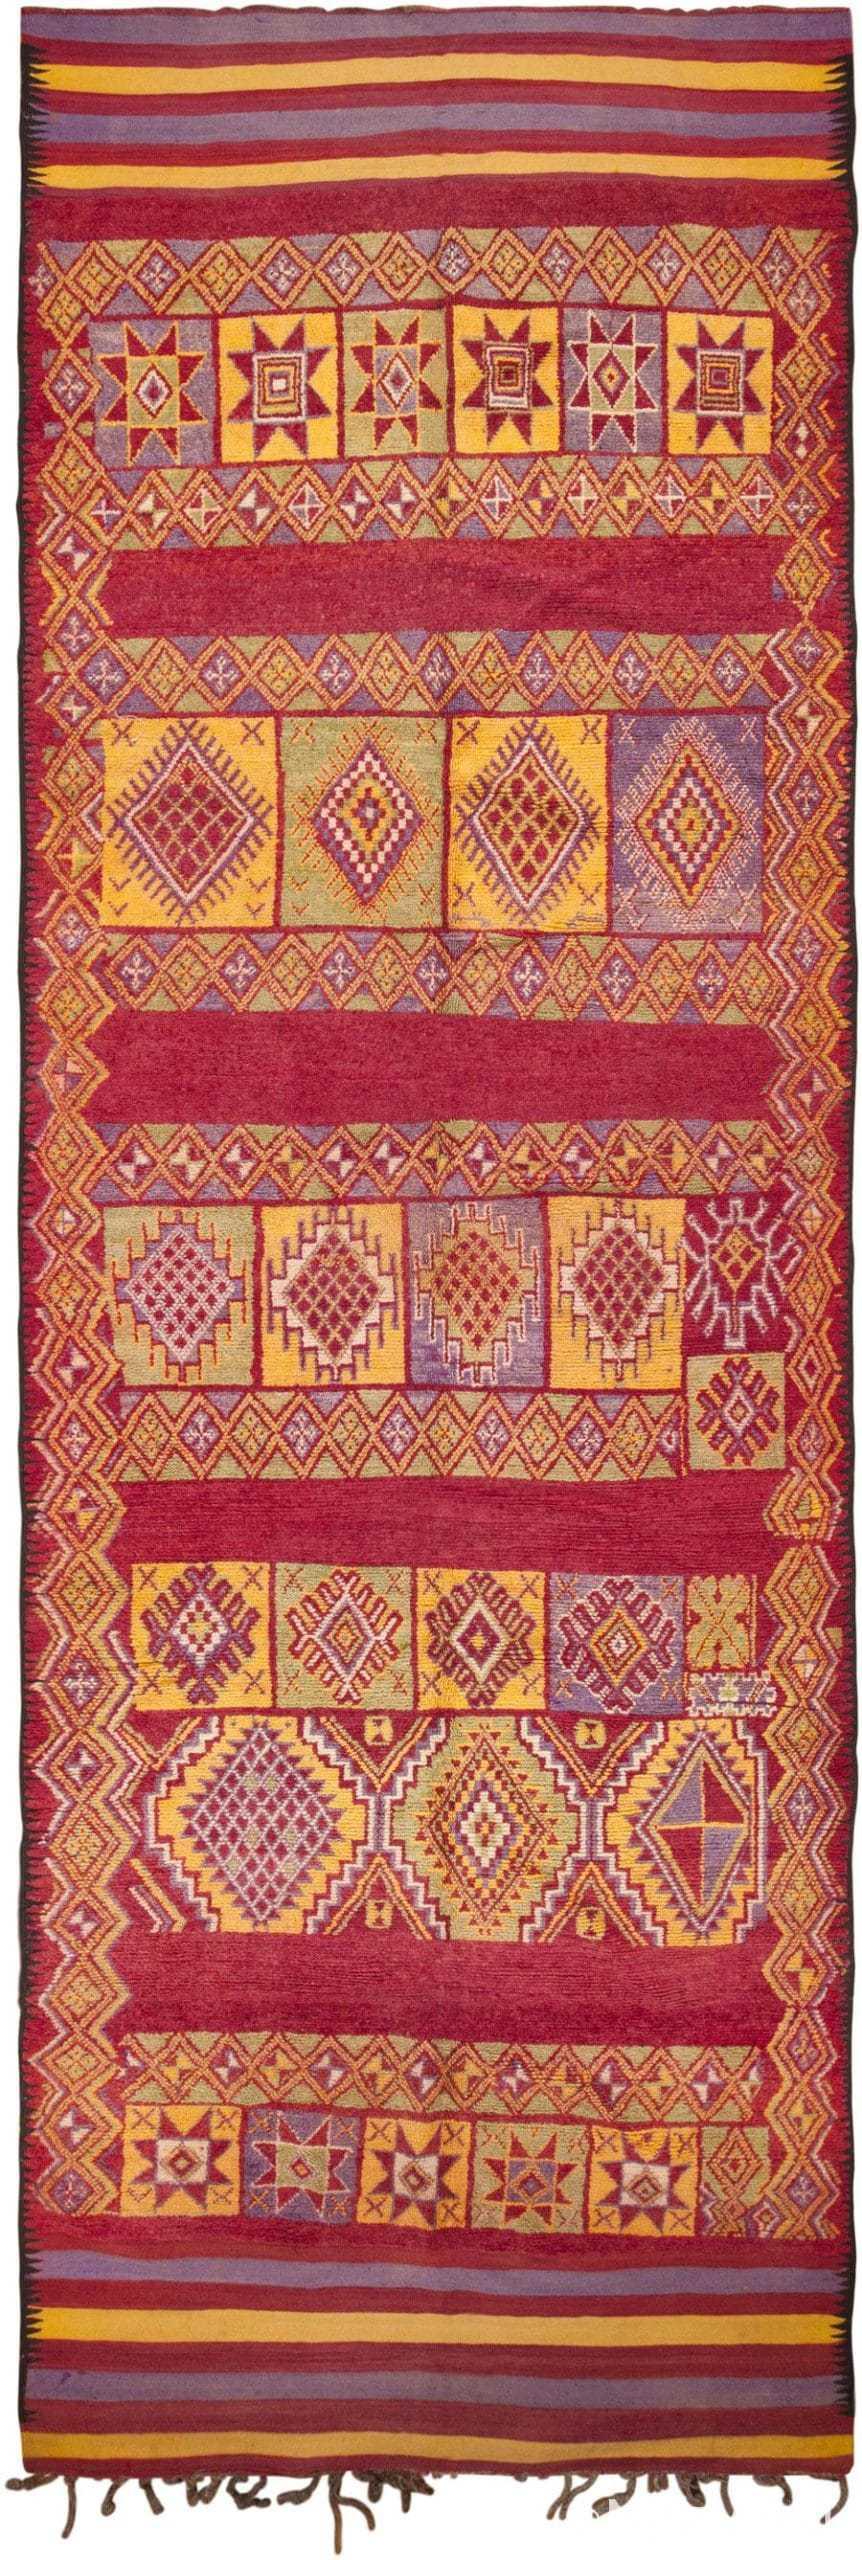 Vintage Moroccan Rug 45751 Large View